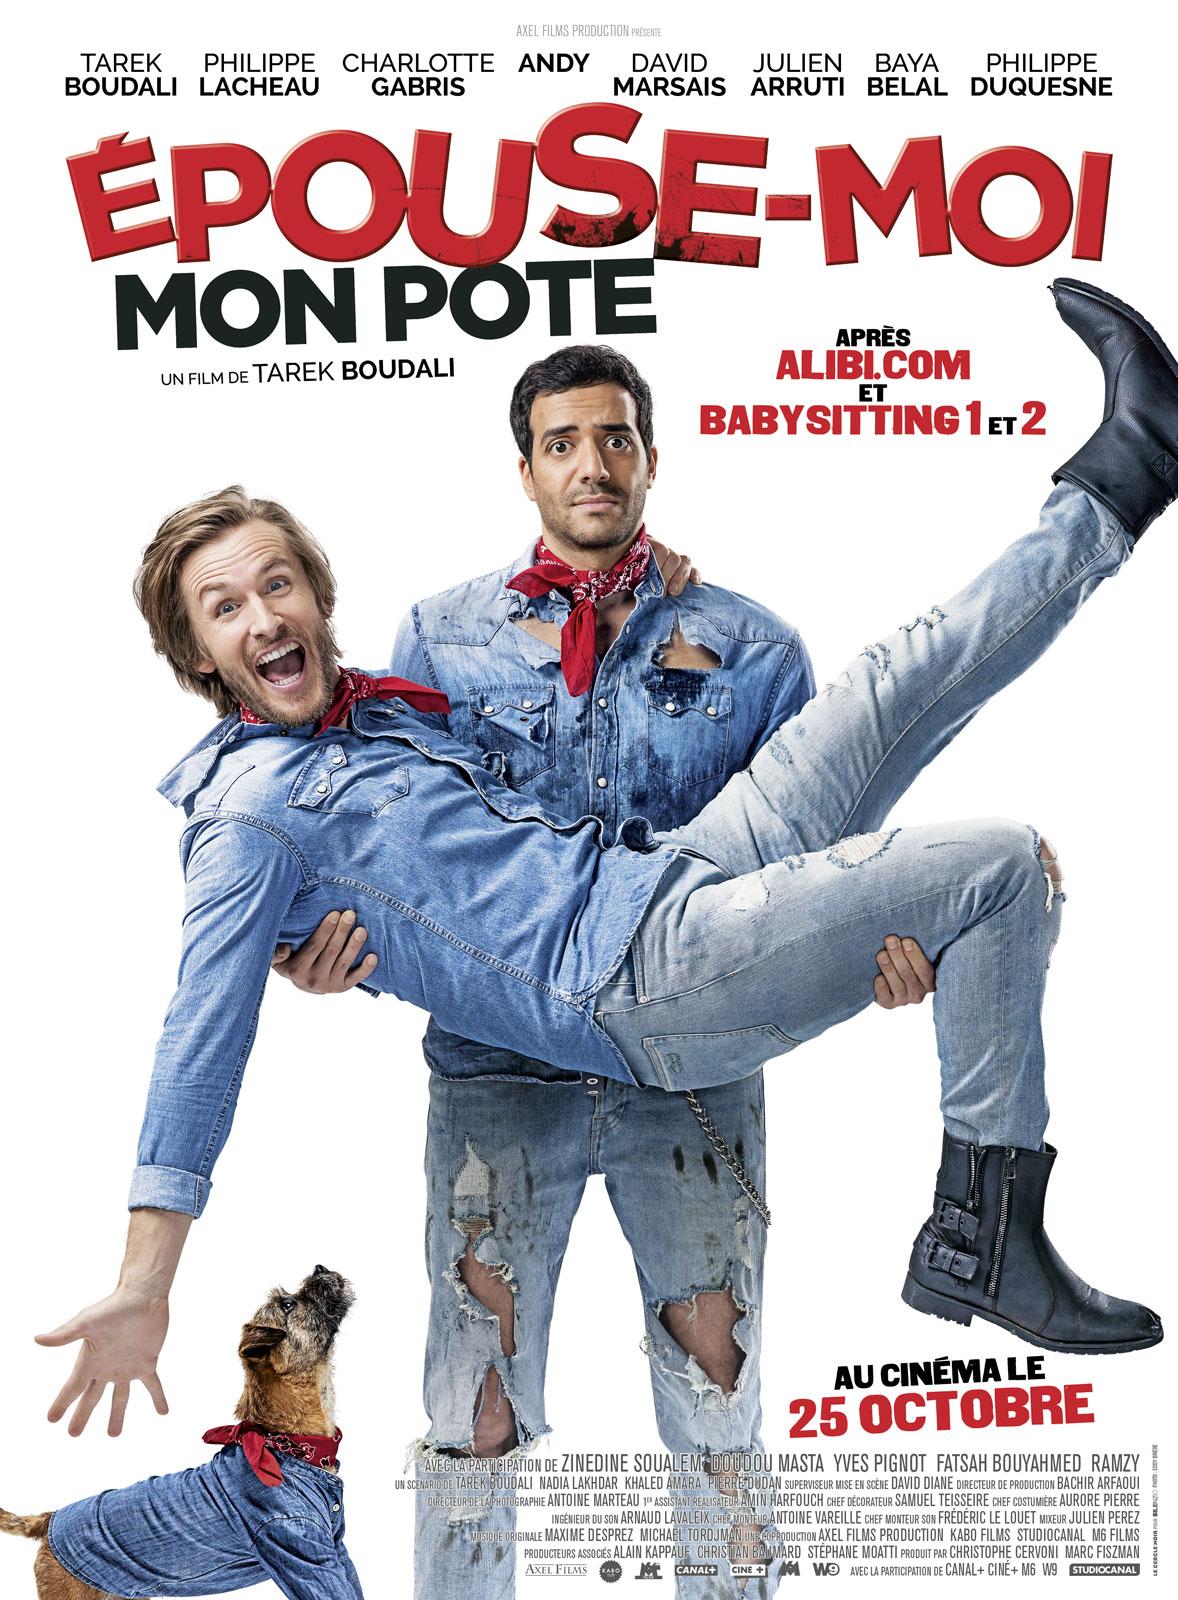 Heirate mich alter schauspieler regie produktion for Chambre 13 film marocain trailer